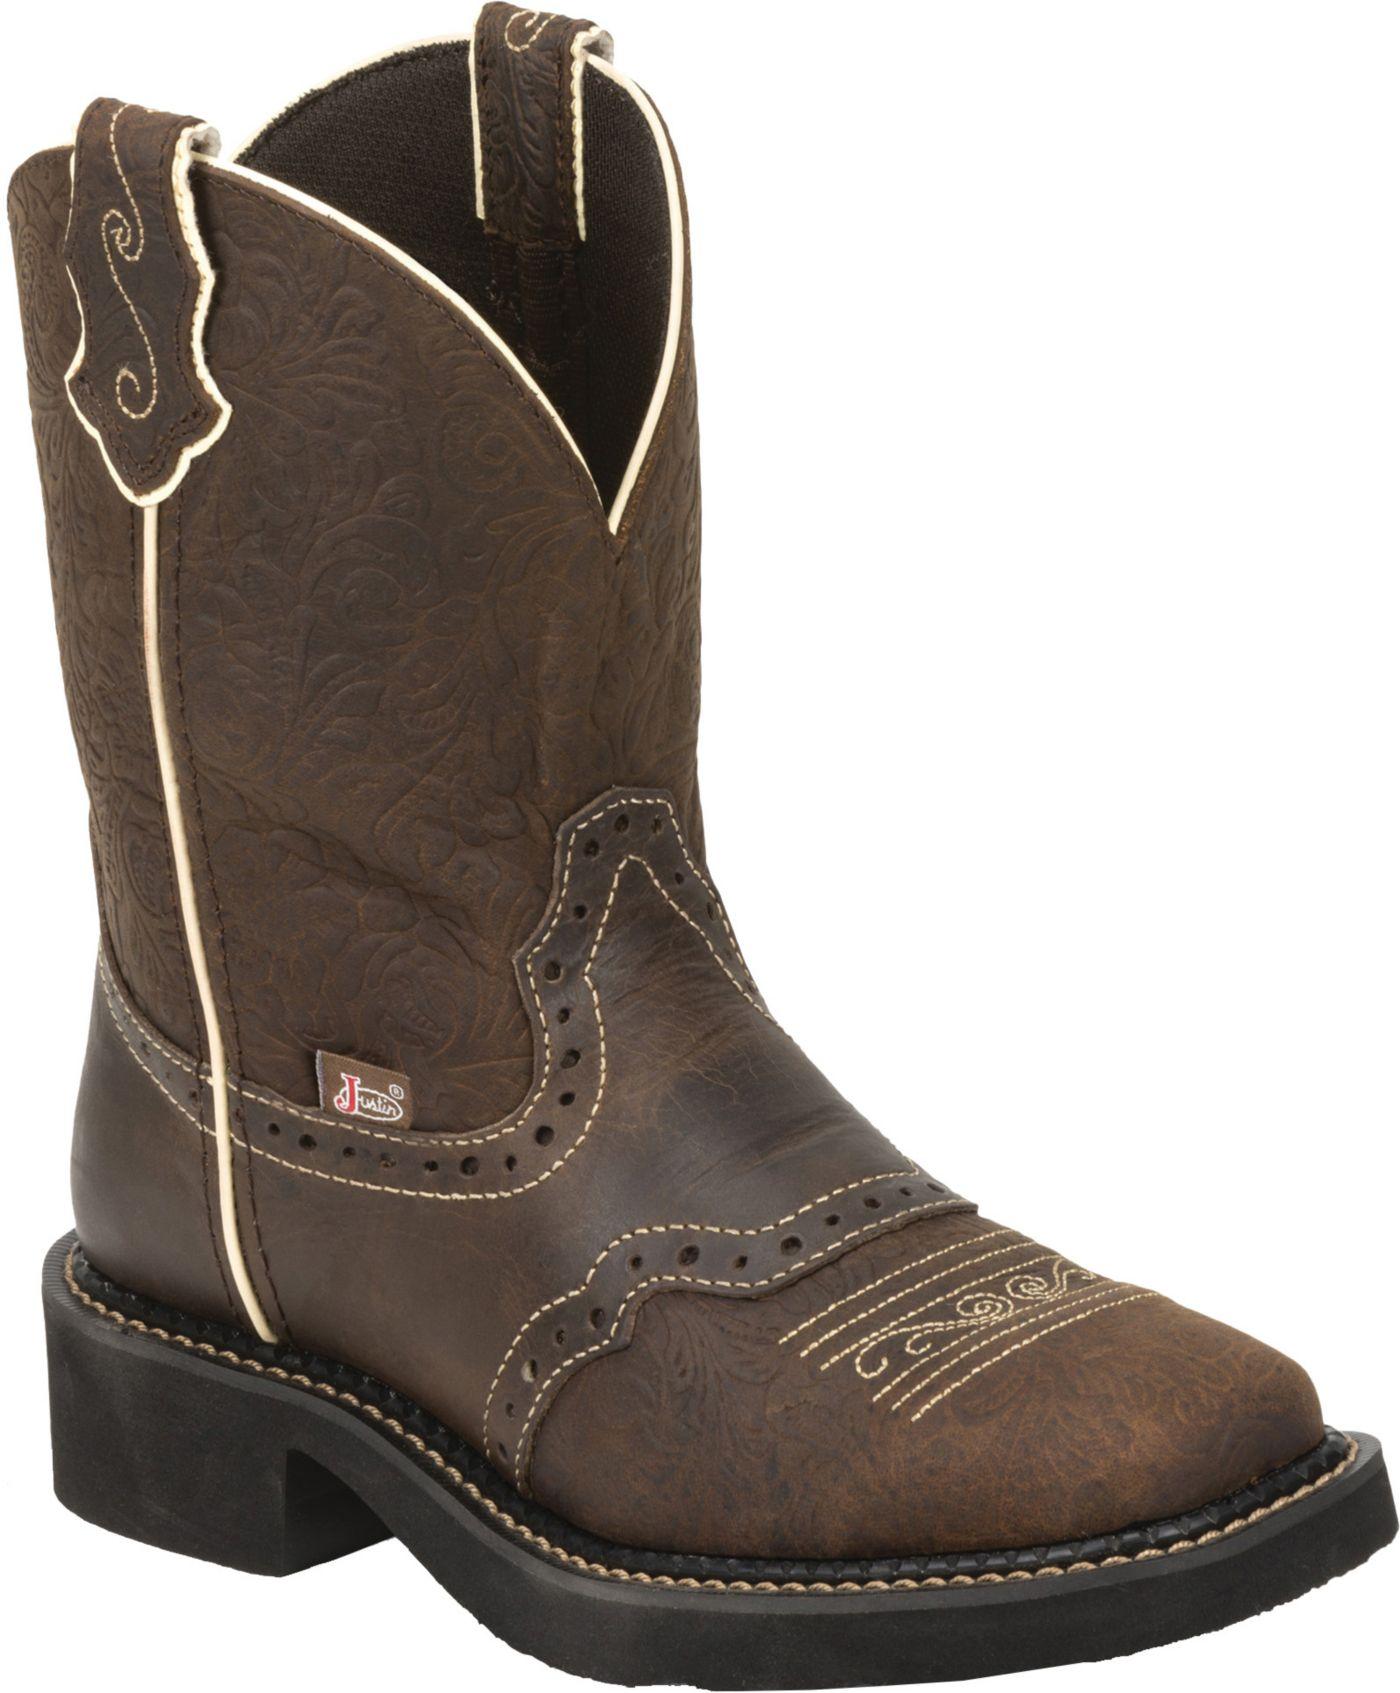 Justin Women's Gypsy Mandra Western Boots